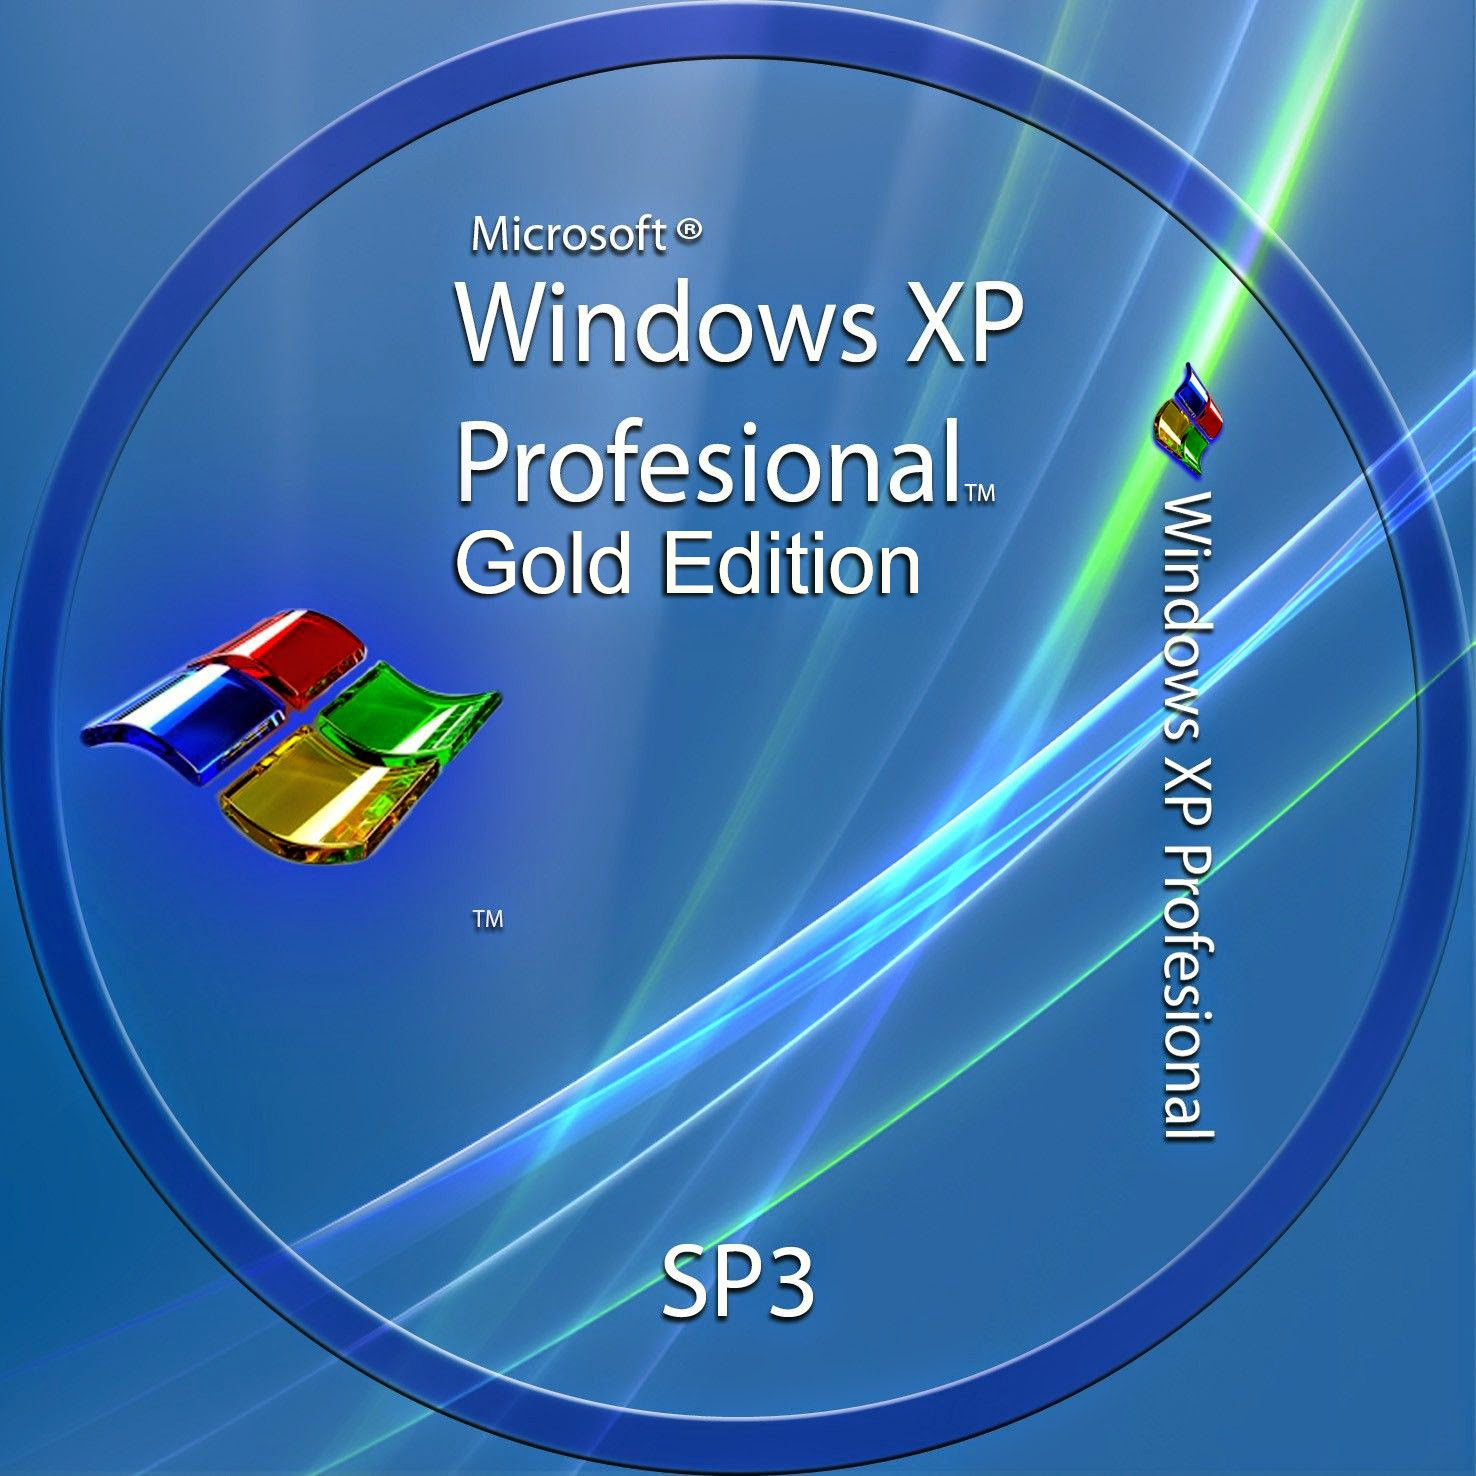 Universal Window XP Professional Gold Edition SP3 Genuine